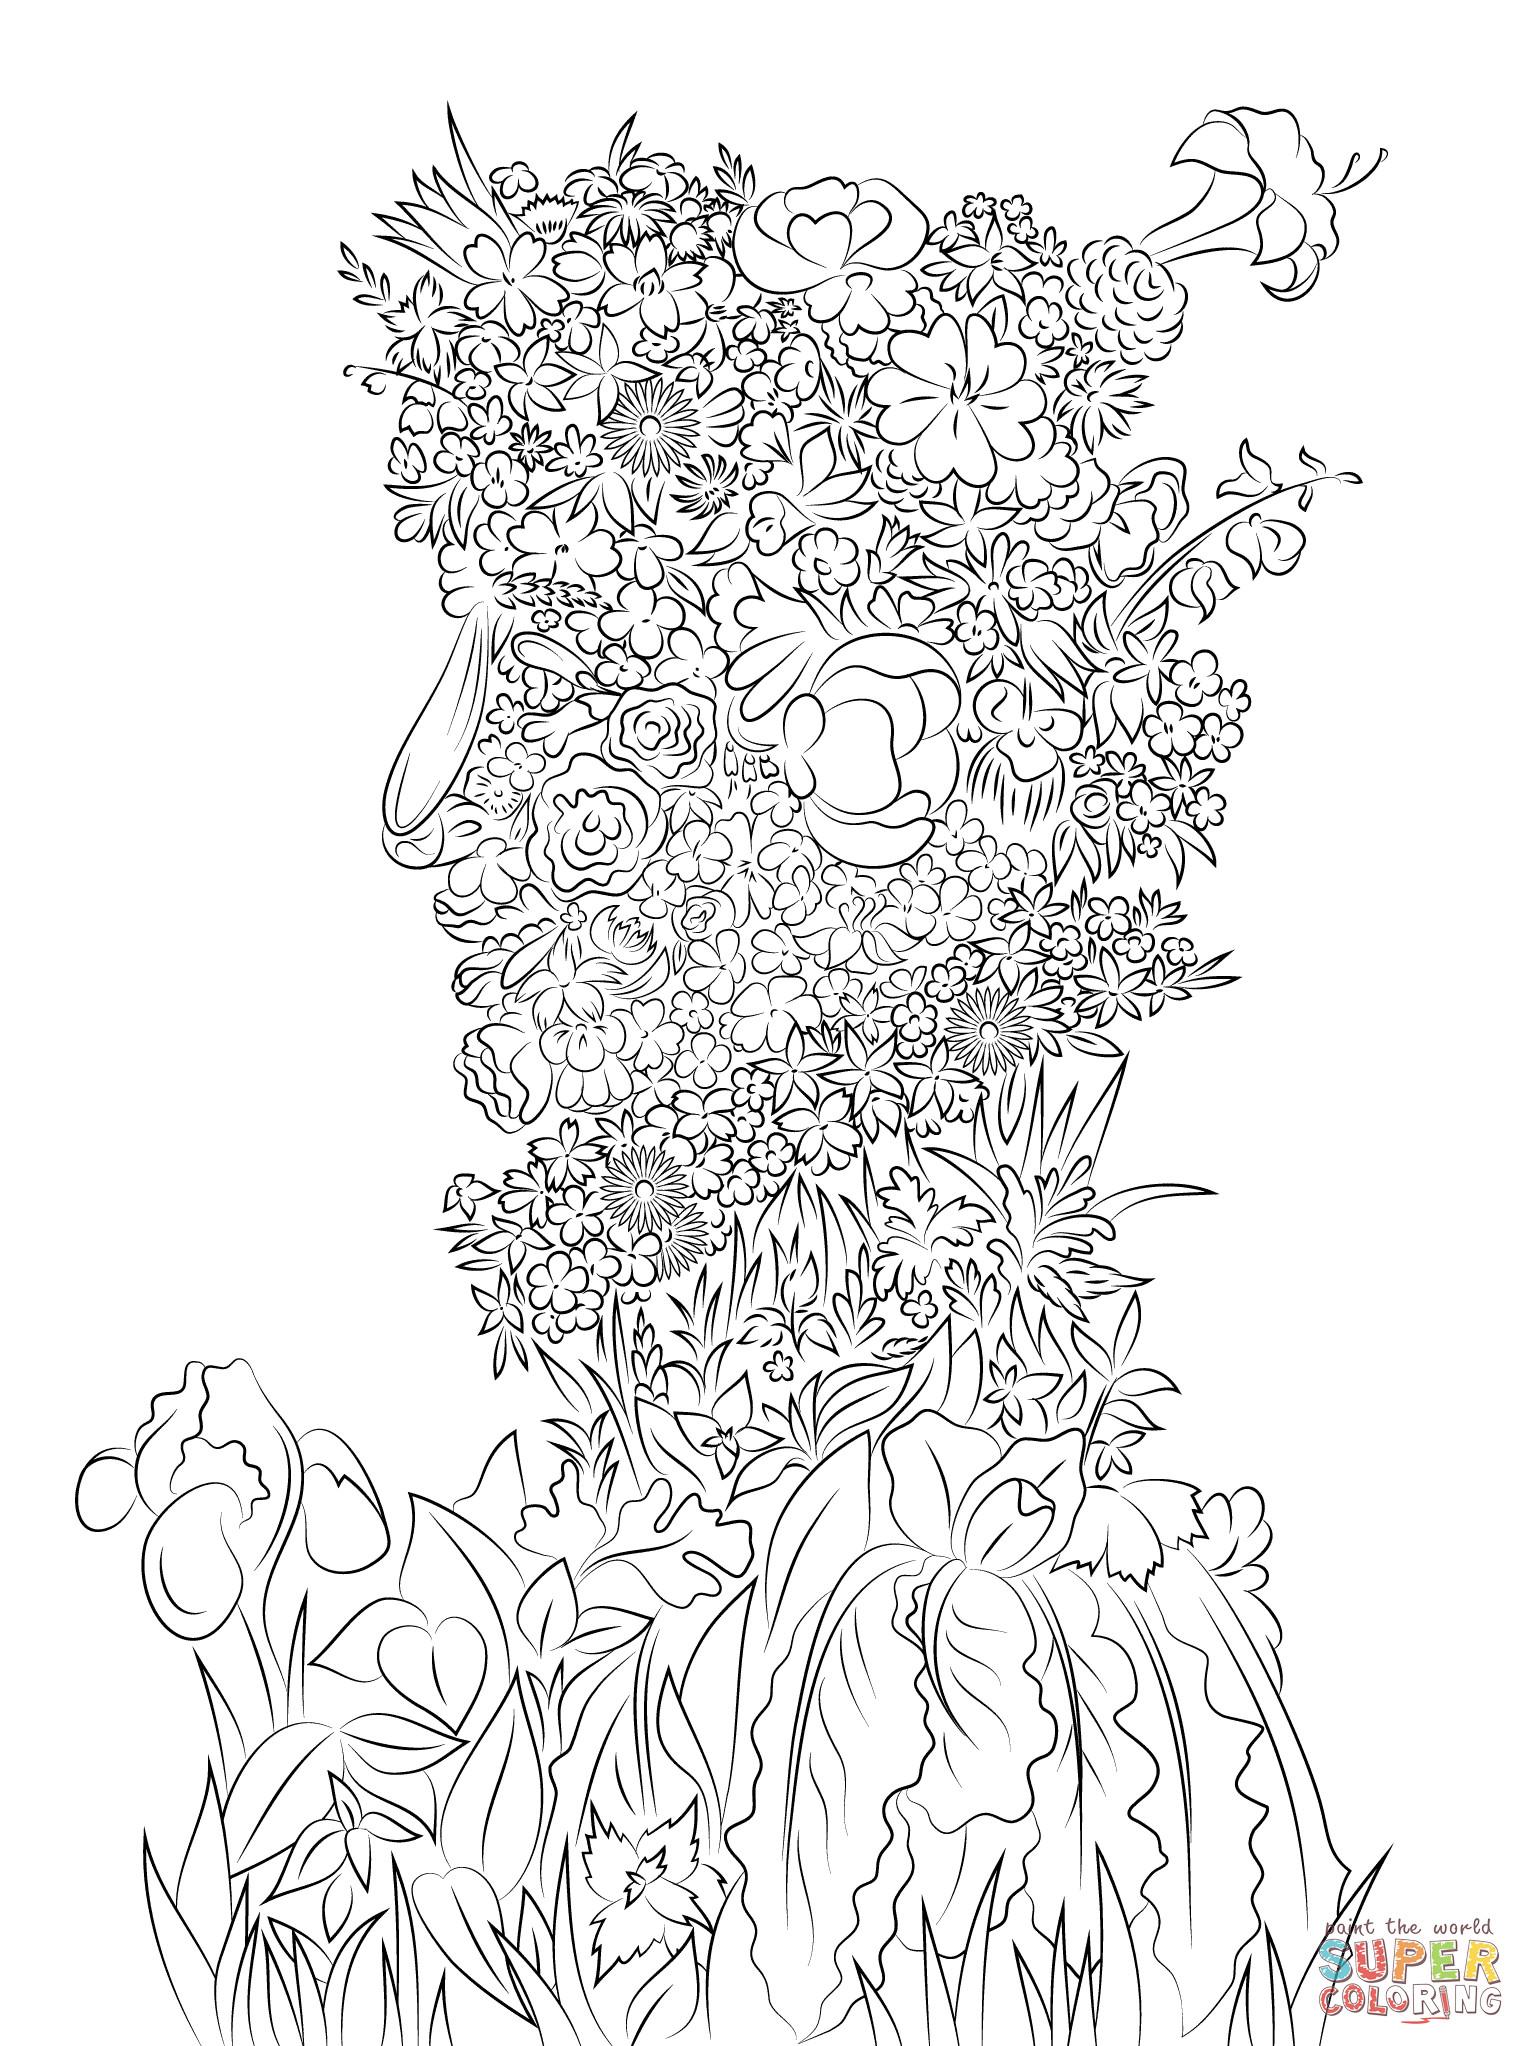 Arcimboldo Ausmalbilder  Coloriage Le printemps par Giuseppe Arcimboldo